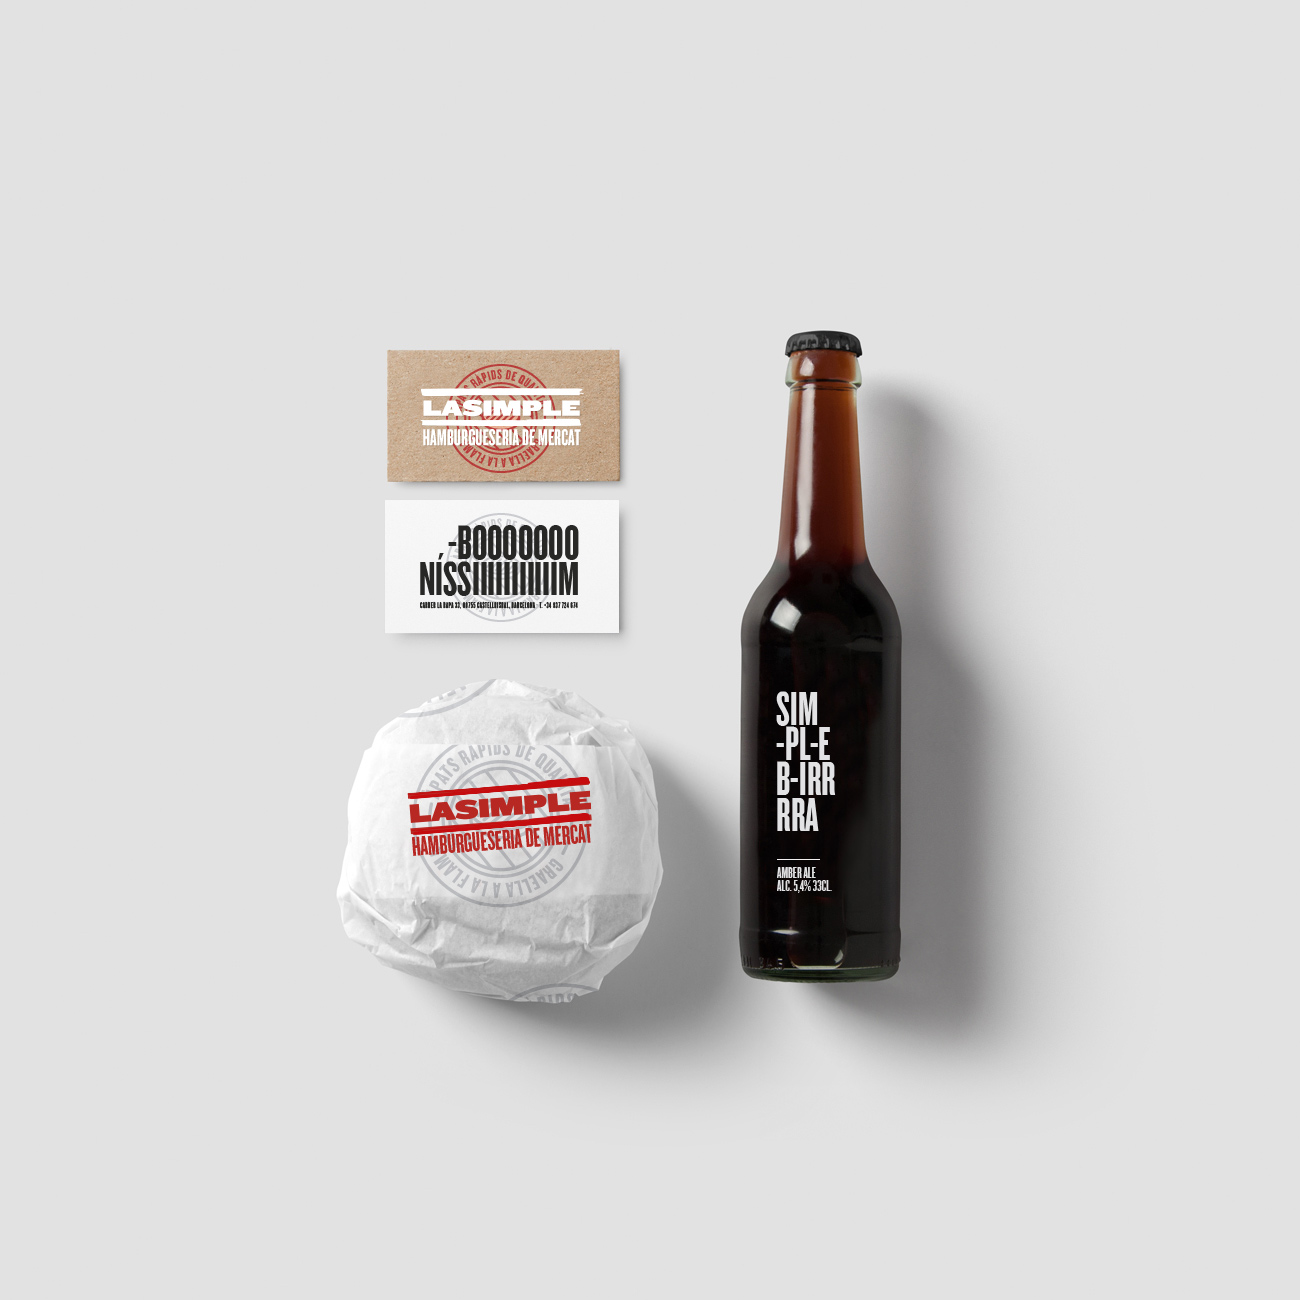 disseny-hamburgueseria-barcelona-02